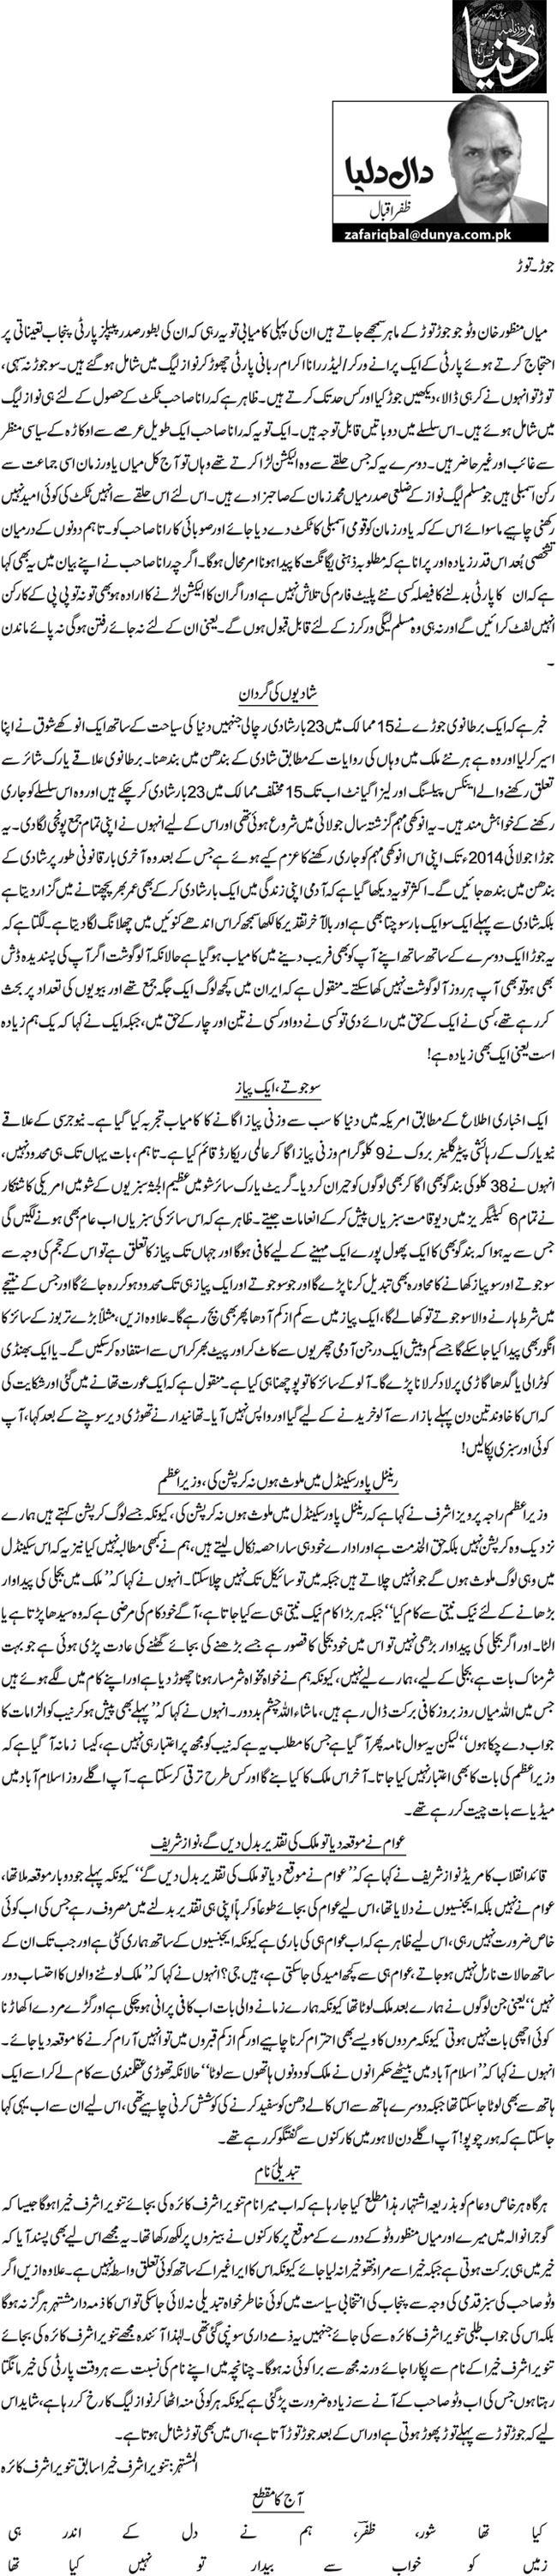 Joor-Toor - Zafar Iqbal